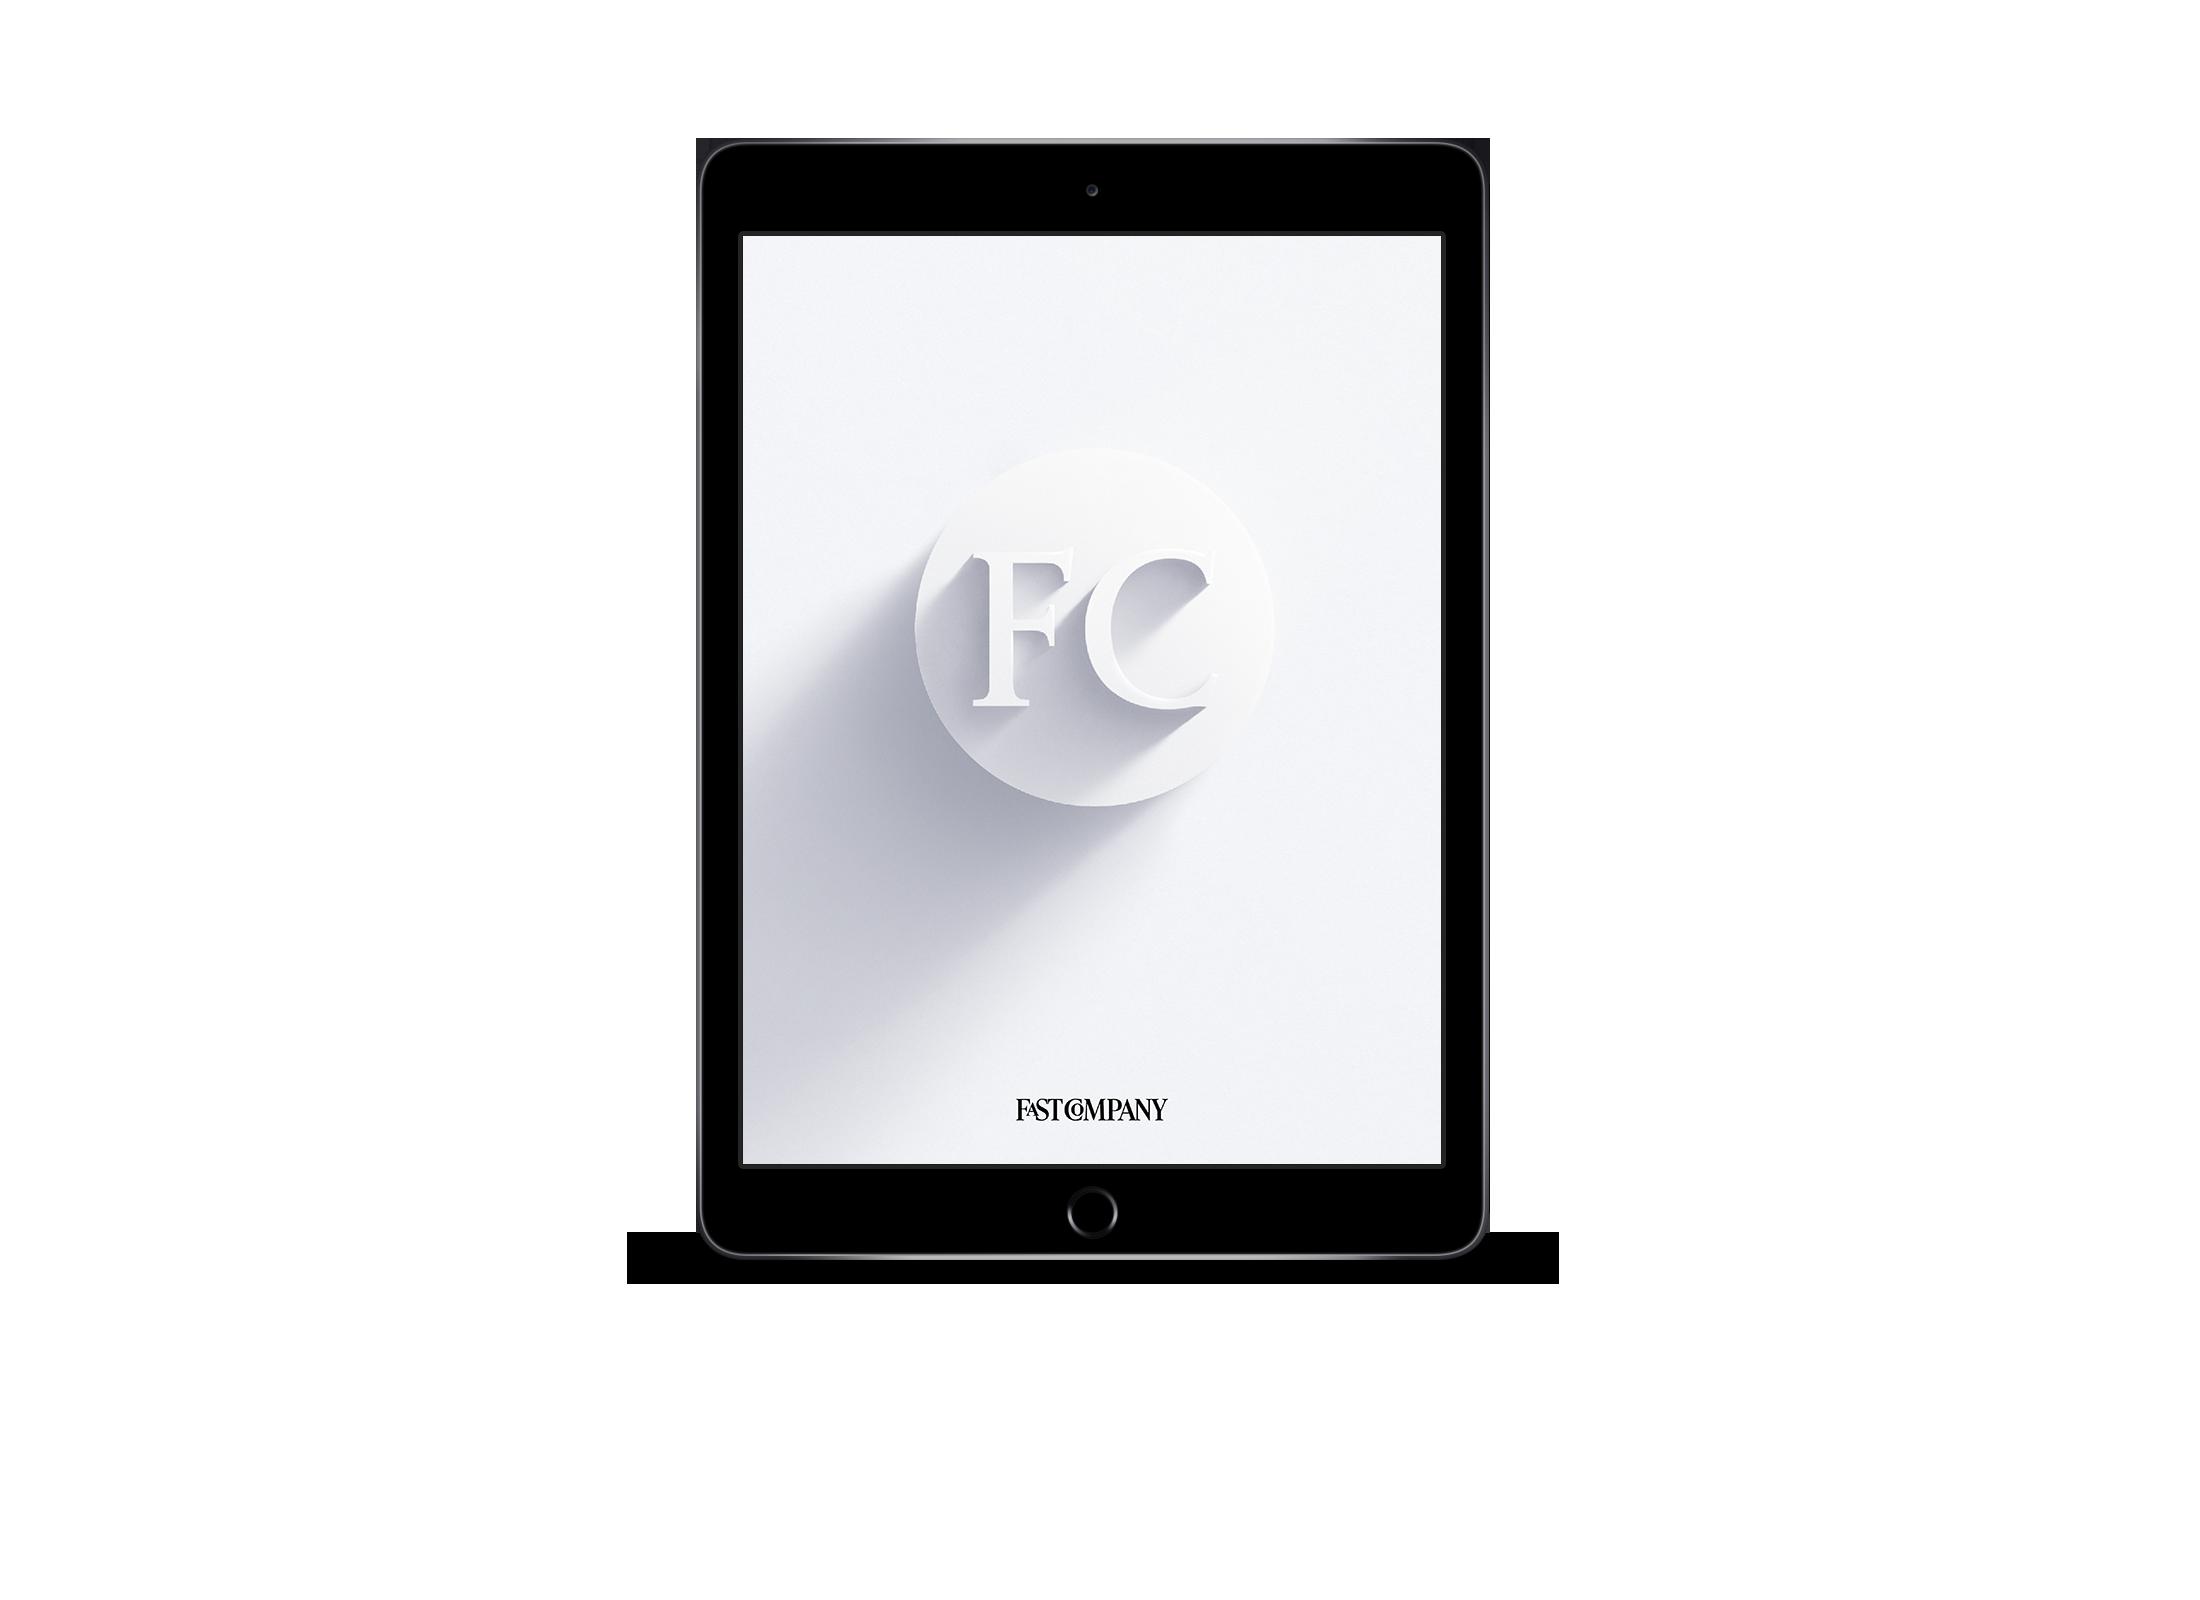 FastCompany_Tablet_01_Splash.01.png